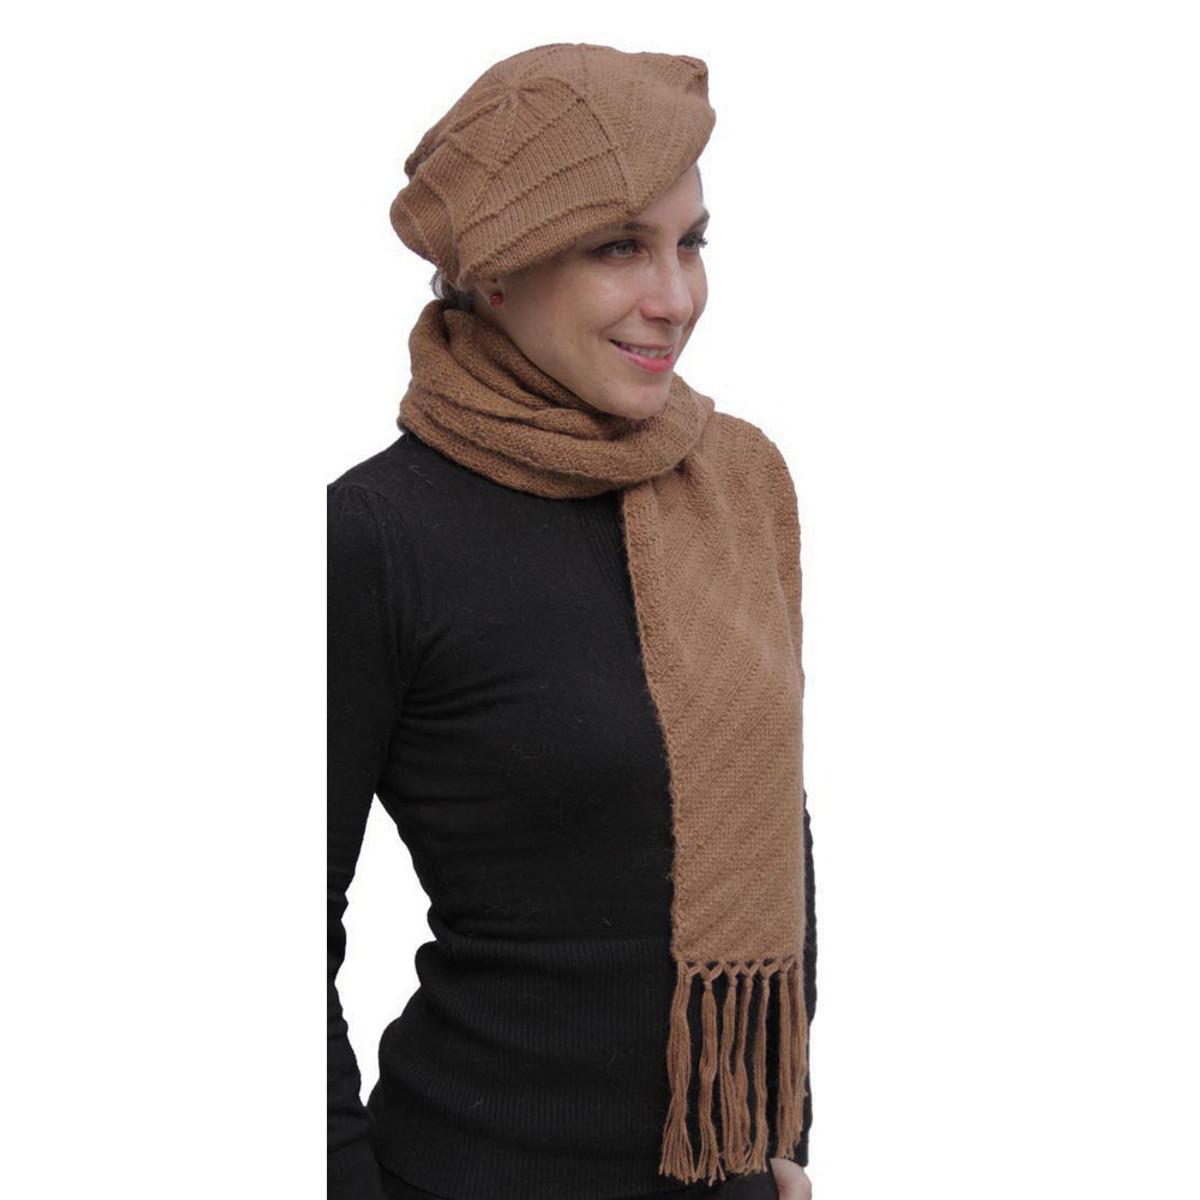 65a15205 Superfine Hand Knitted Alpaca Wool Beret & Scarf Camel (33D-012-205 ...